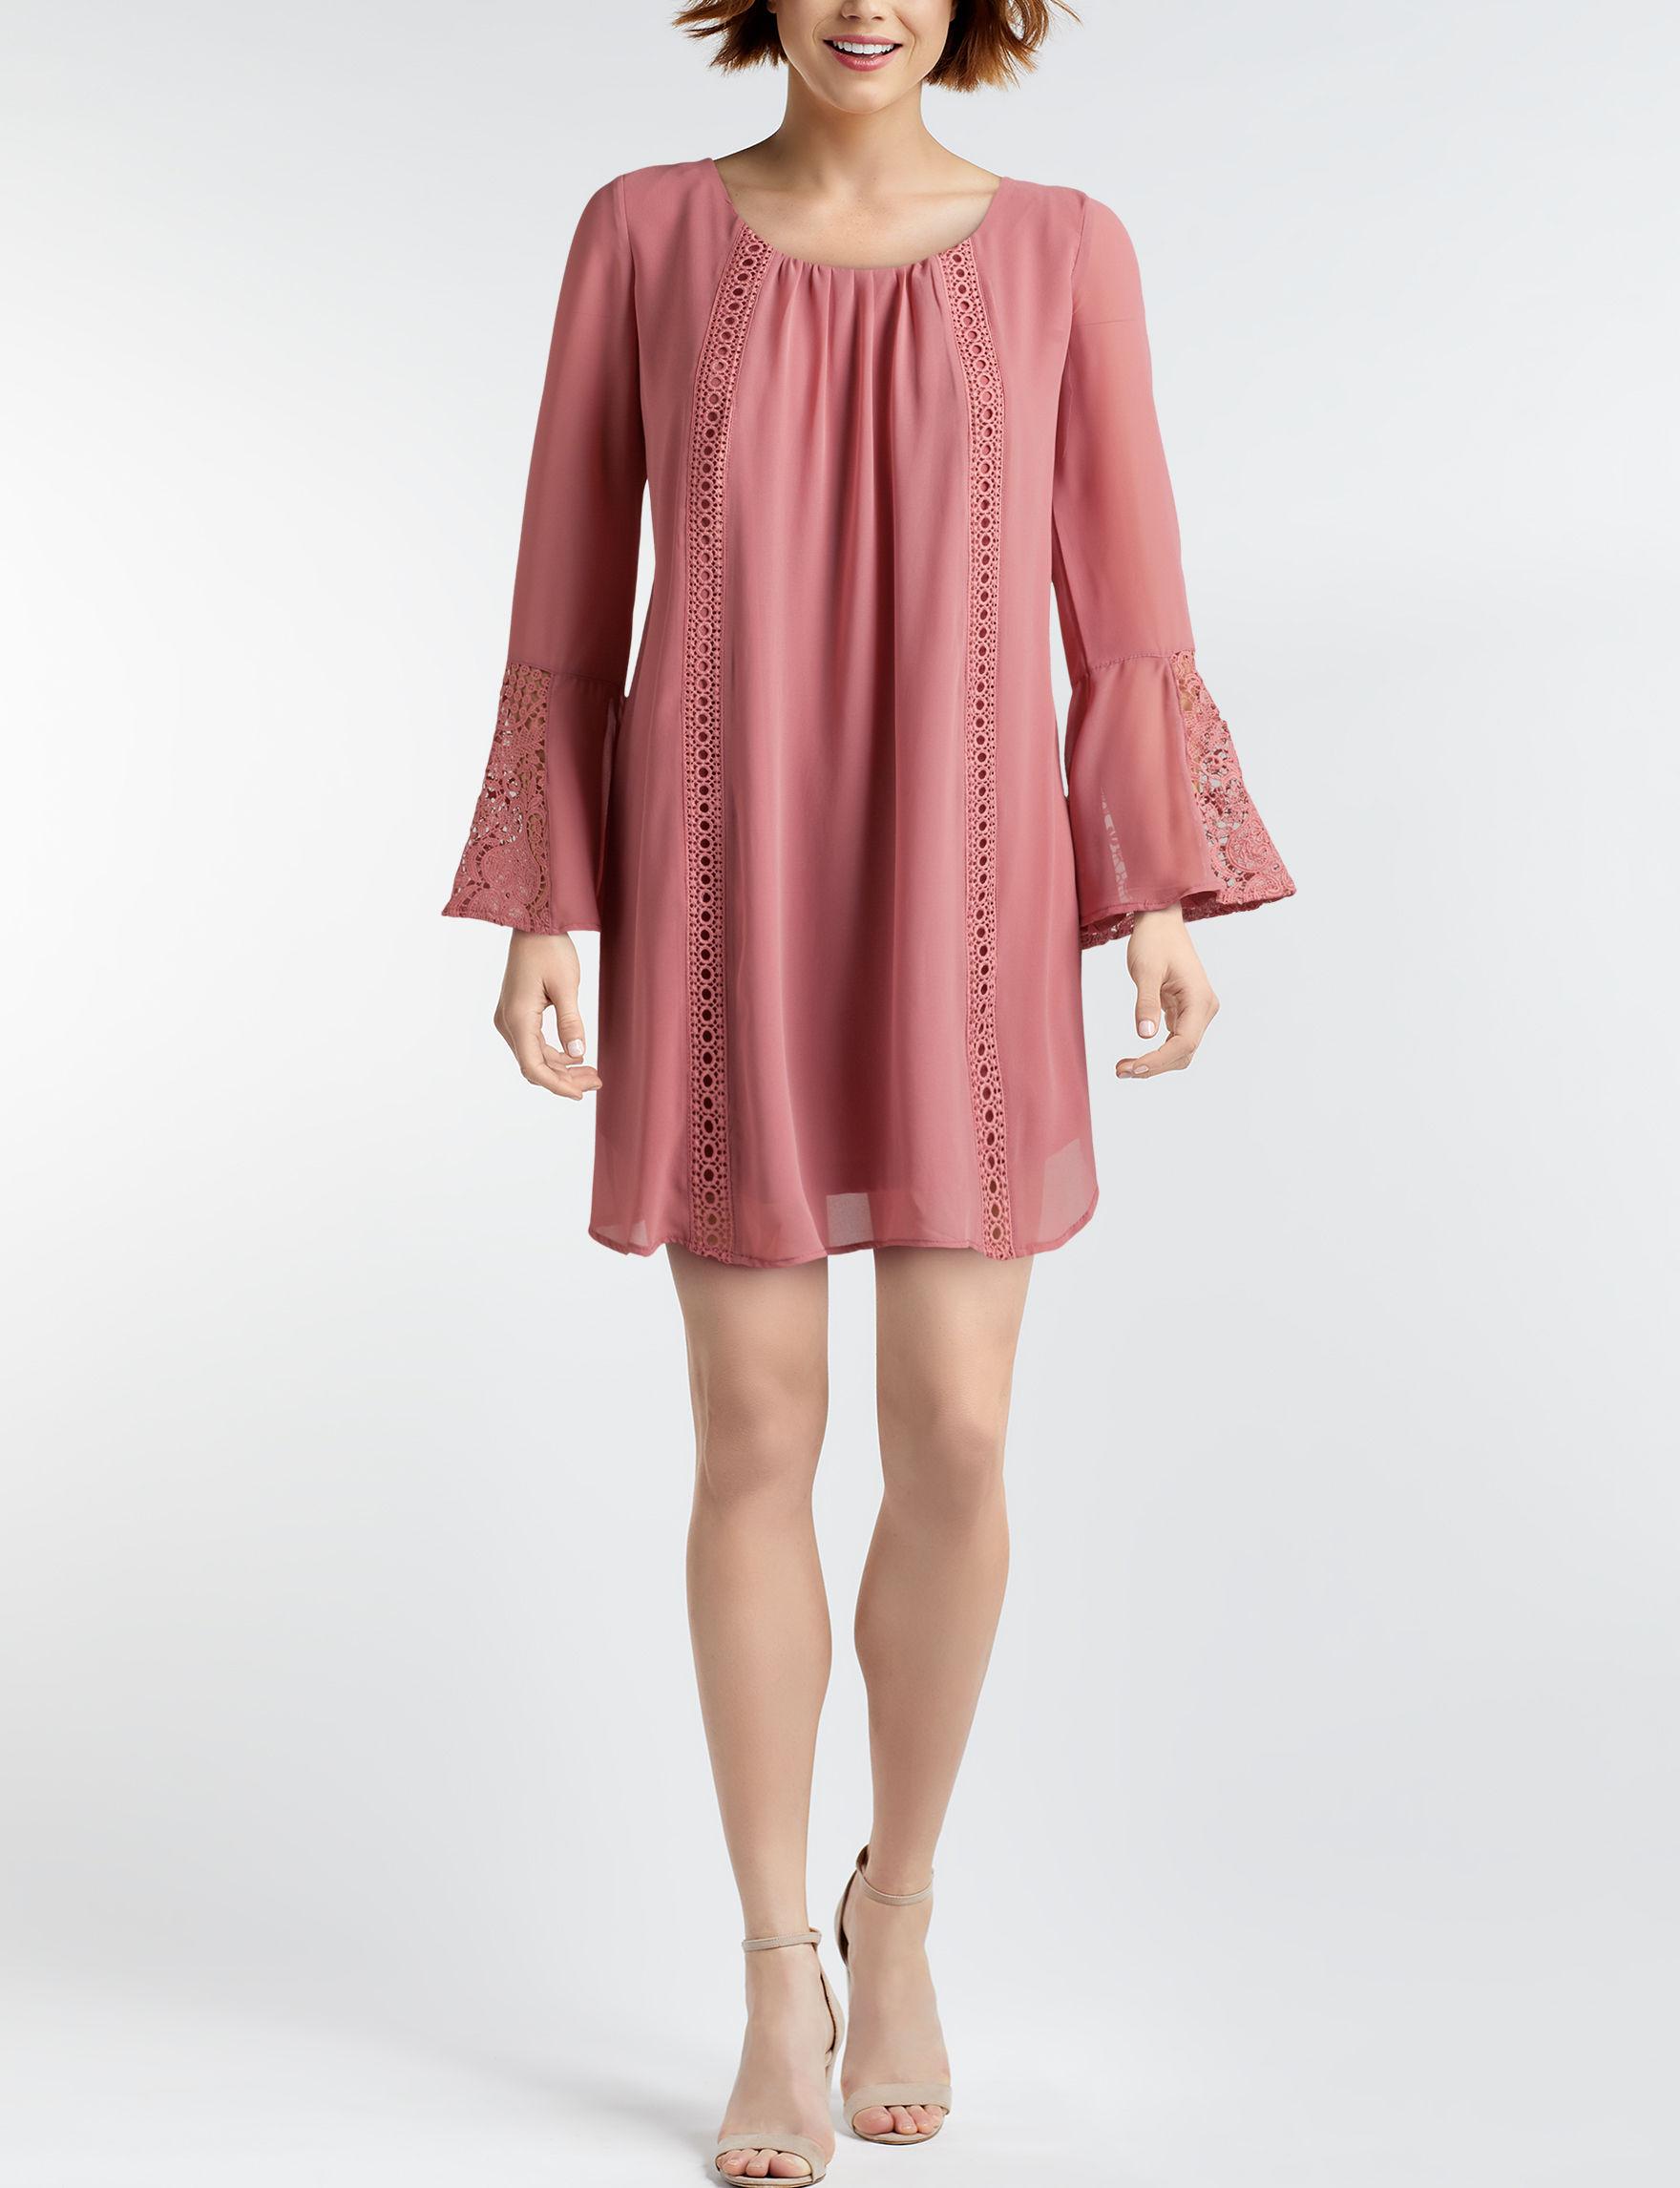 Sequin Hearts Mauve Everyday & Casual Shift Dresses